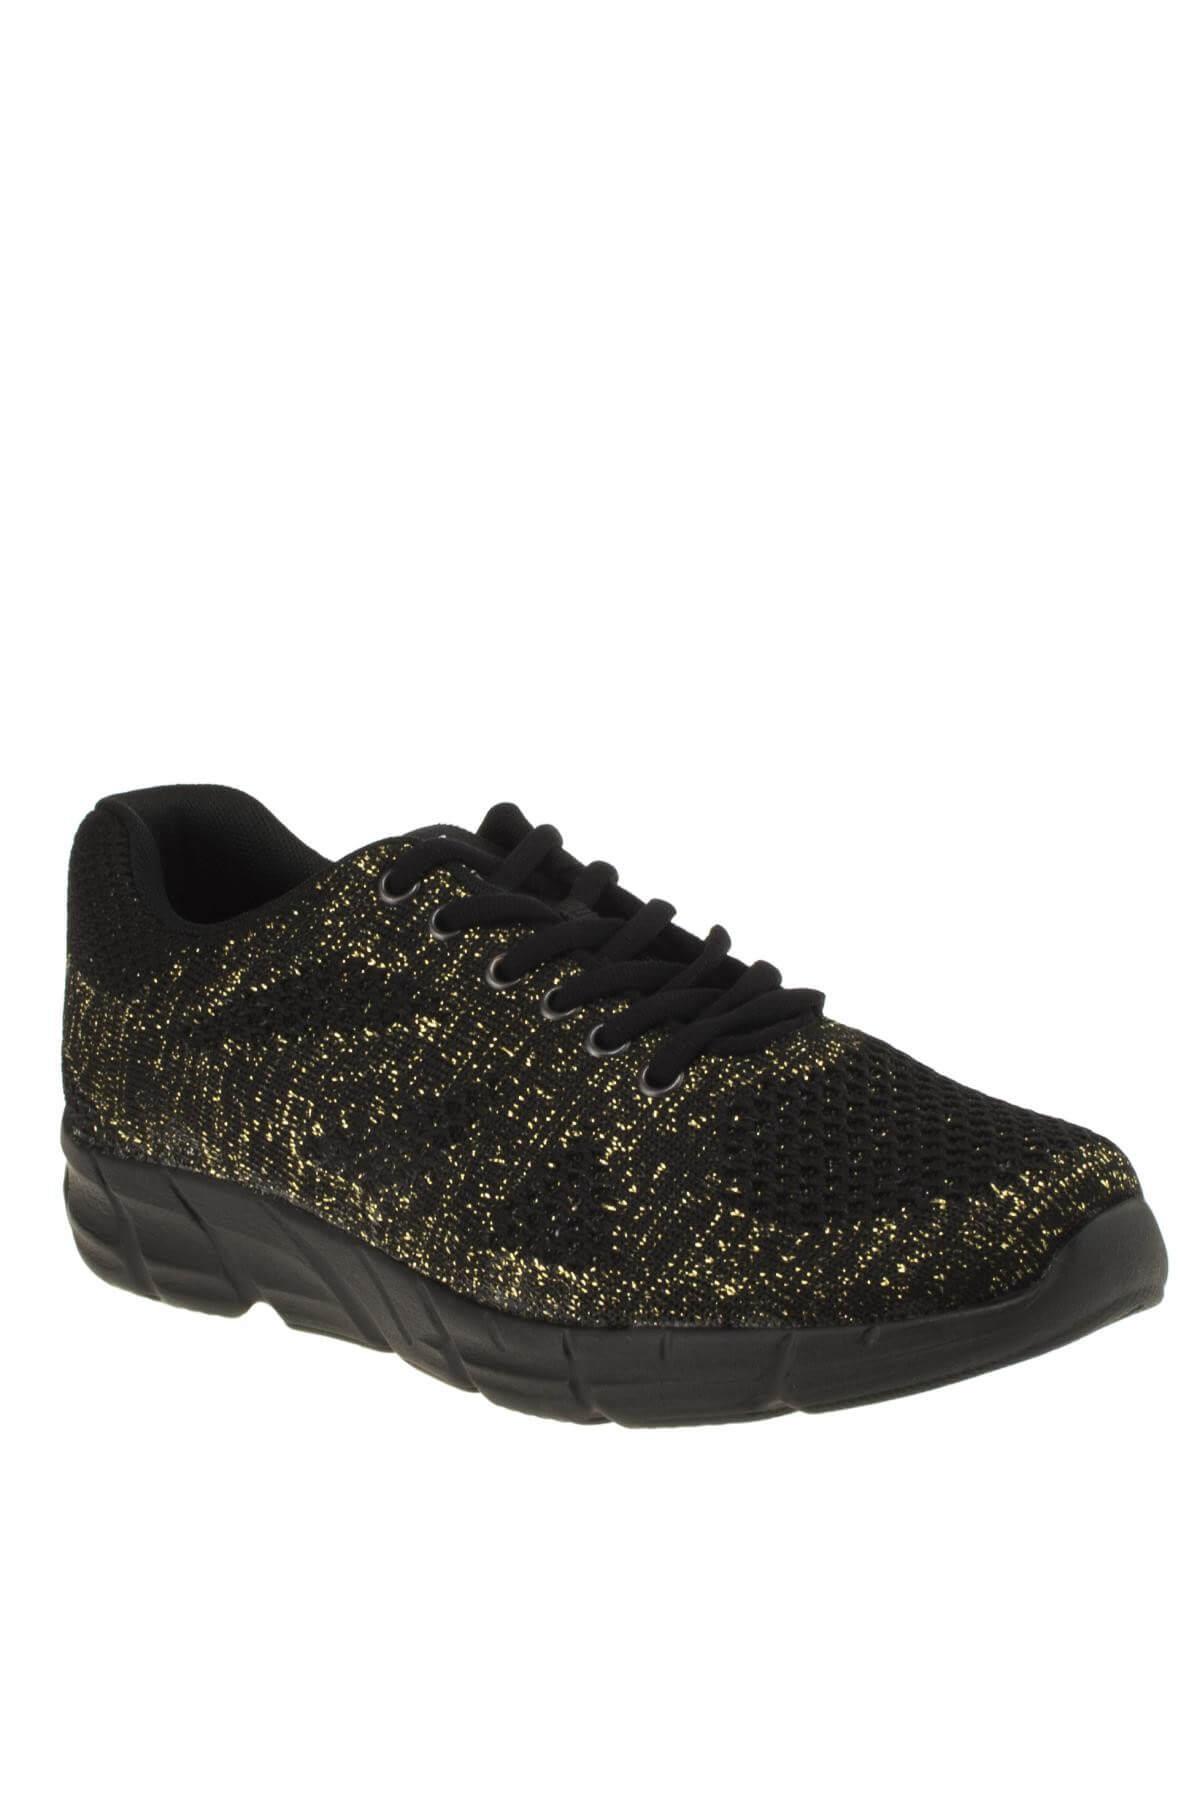 Scooter Unisex Siyah Sarı  Sneaker 186 5437G 1